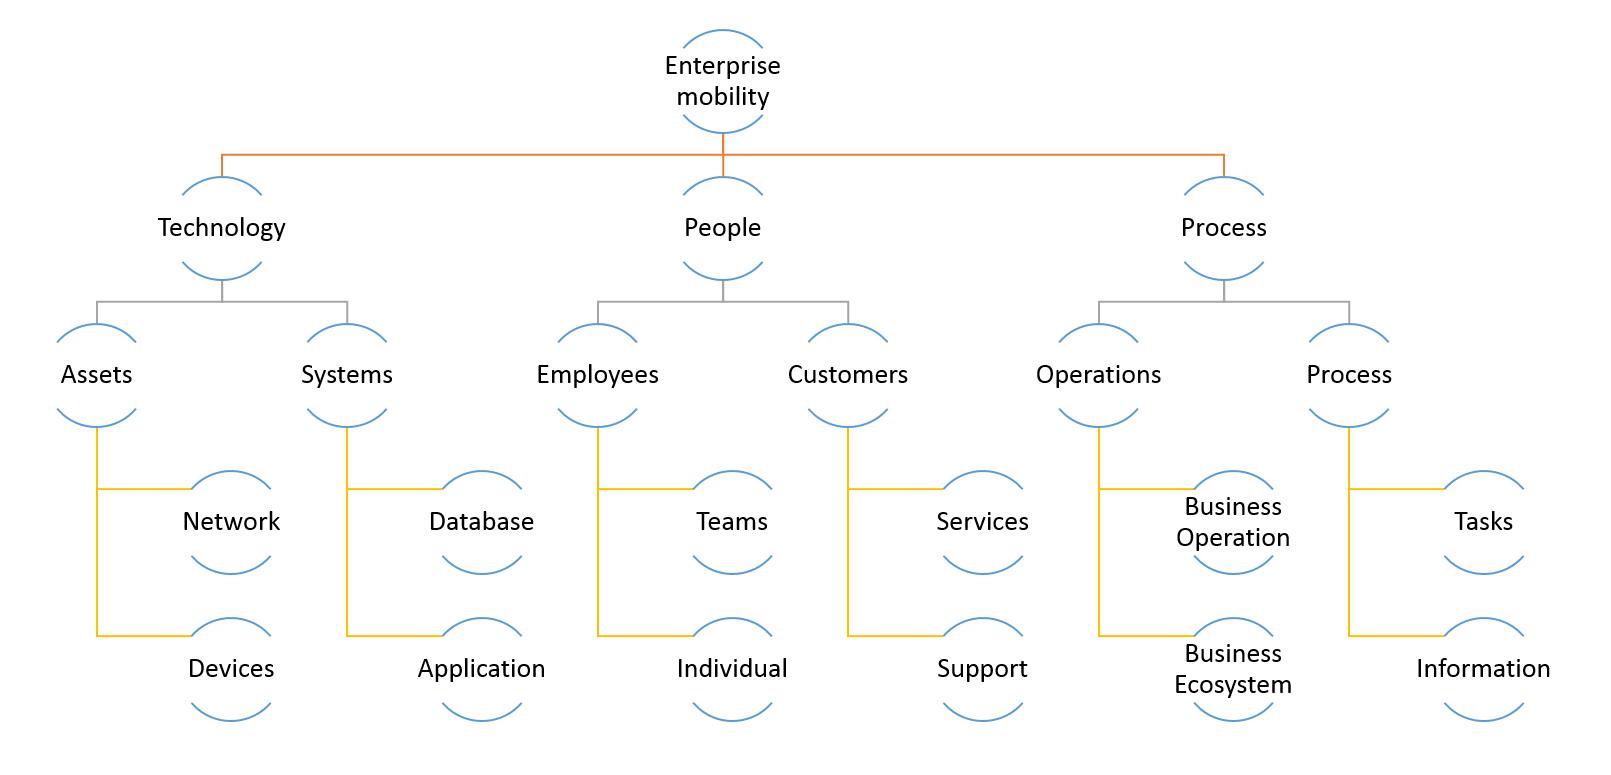 Enterprise_mobility_information